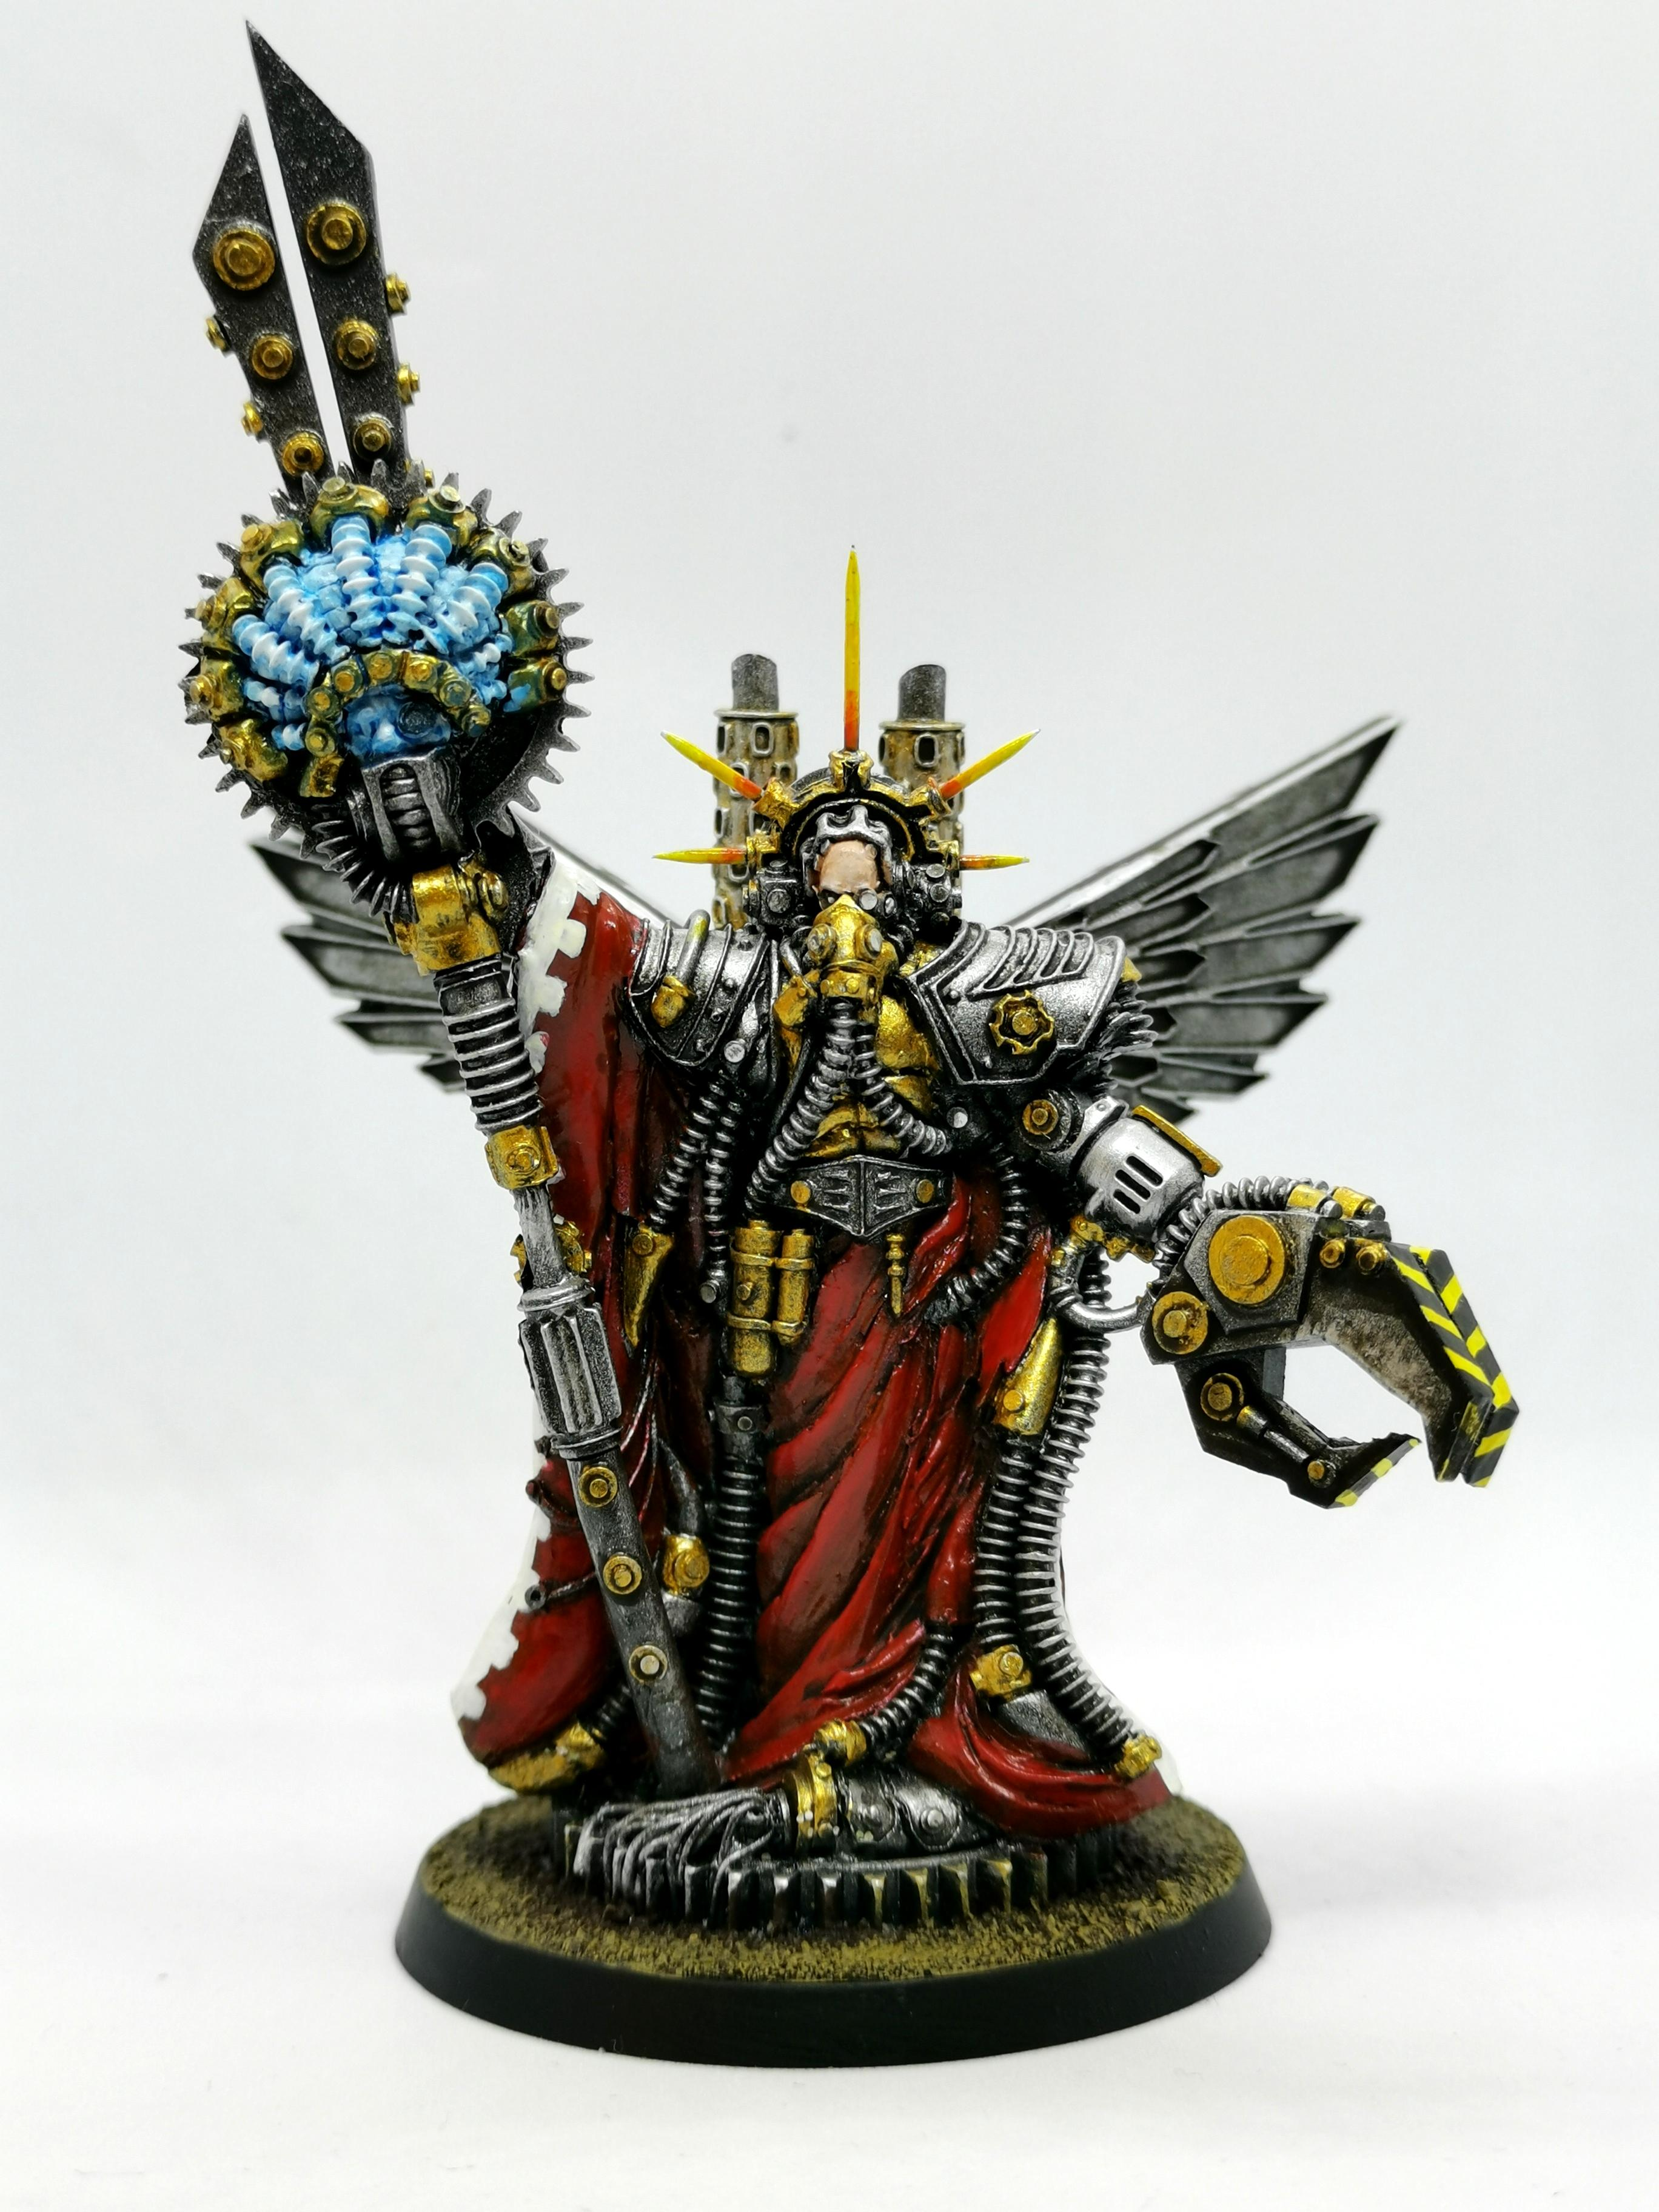 Adeptus Mechanicus, Bio-tech Covenant, Hitech Miniatures, Tech-priest